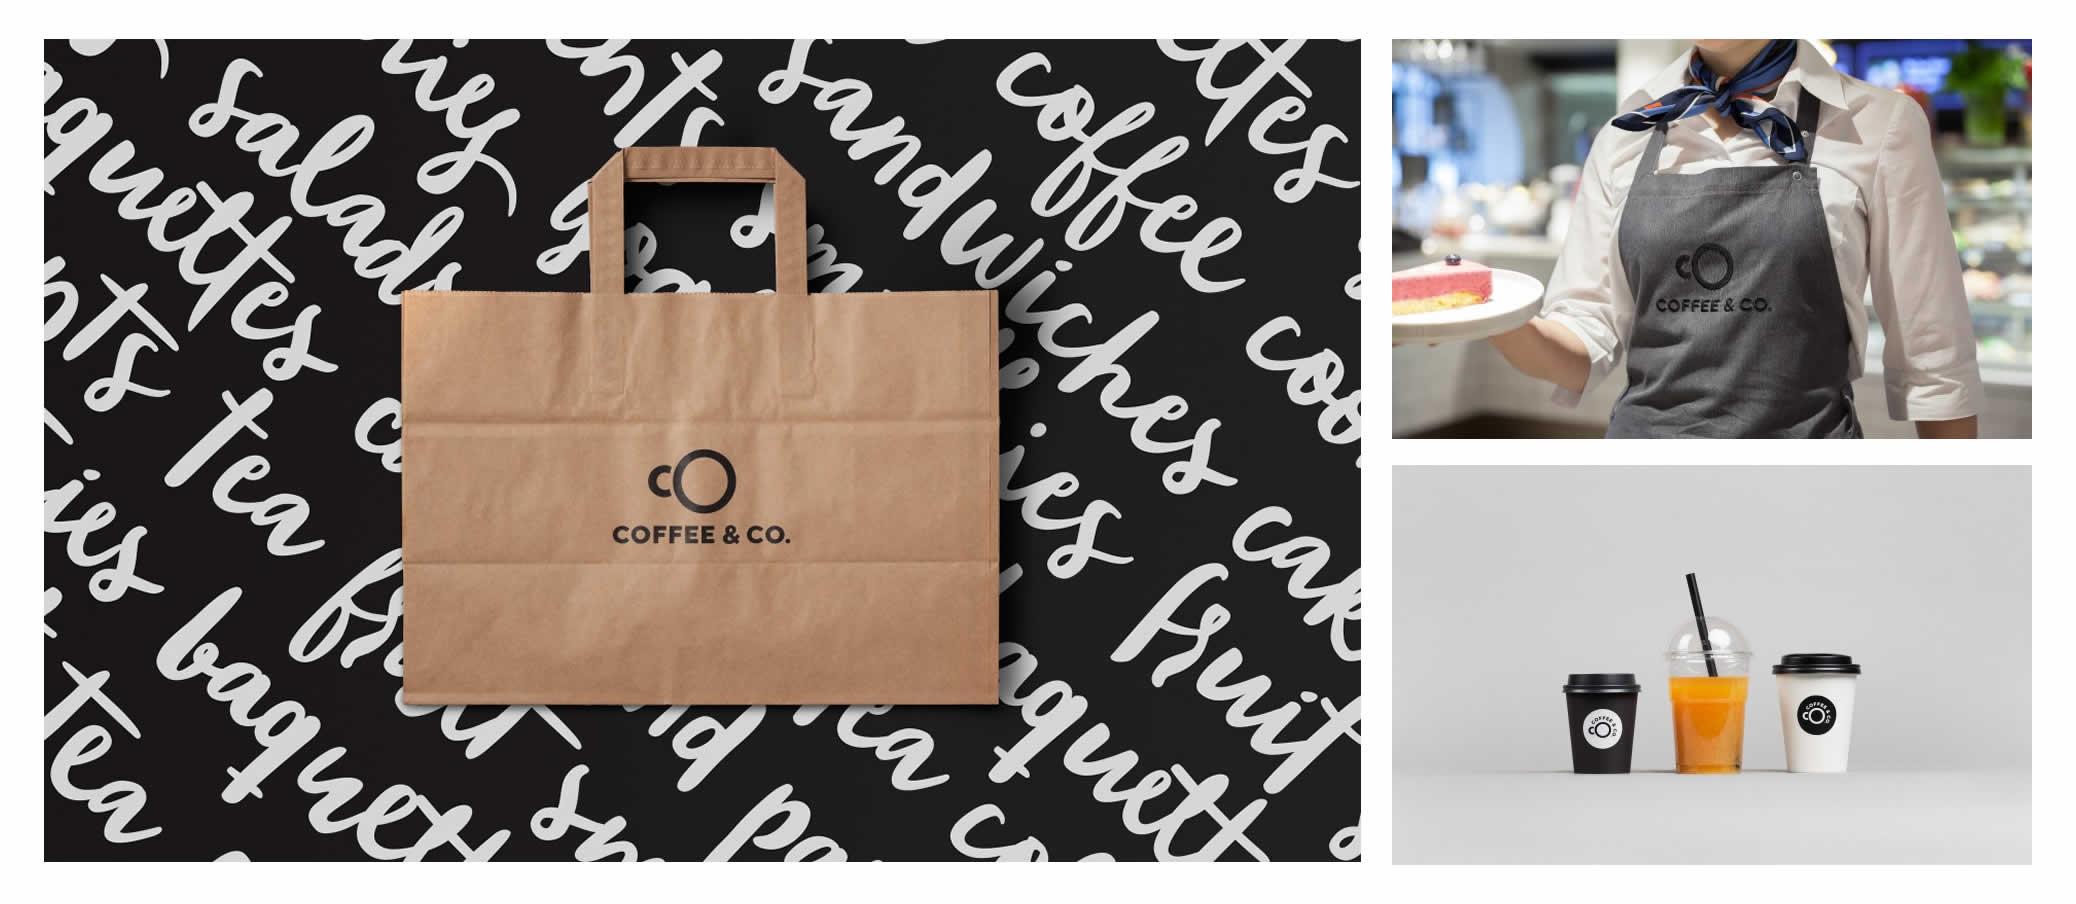 Coffee & Co. Brand Identity Spotlight